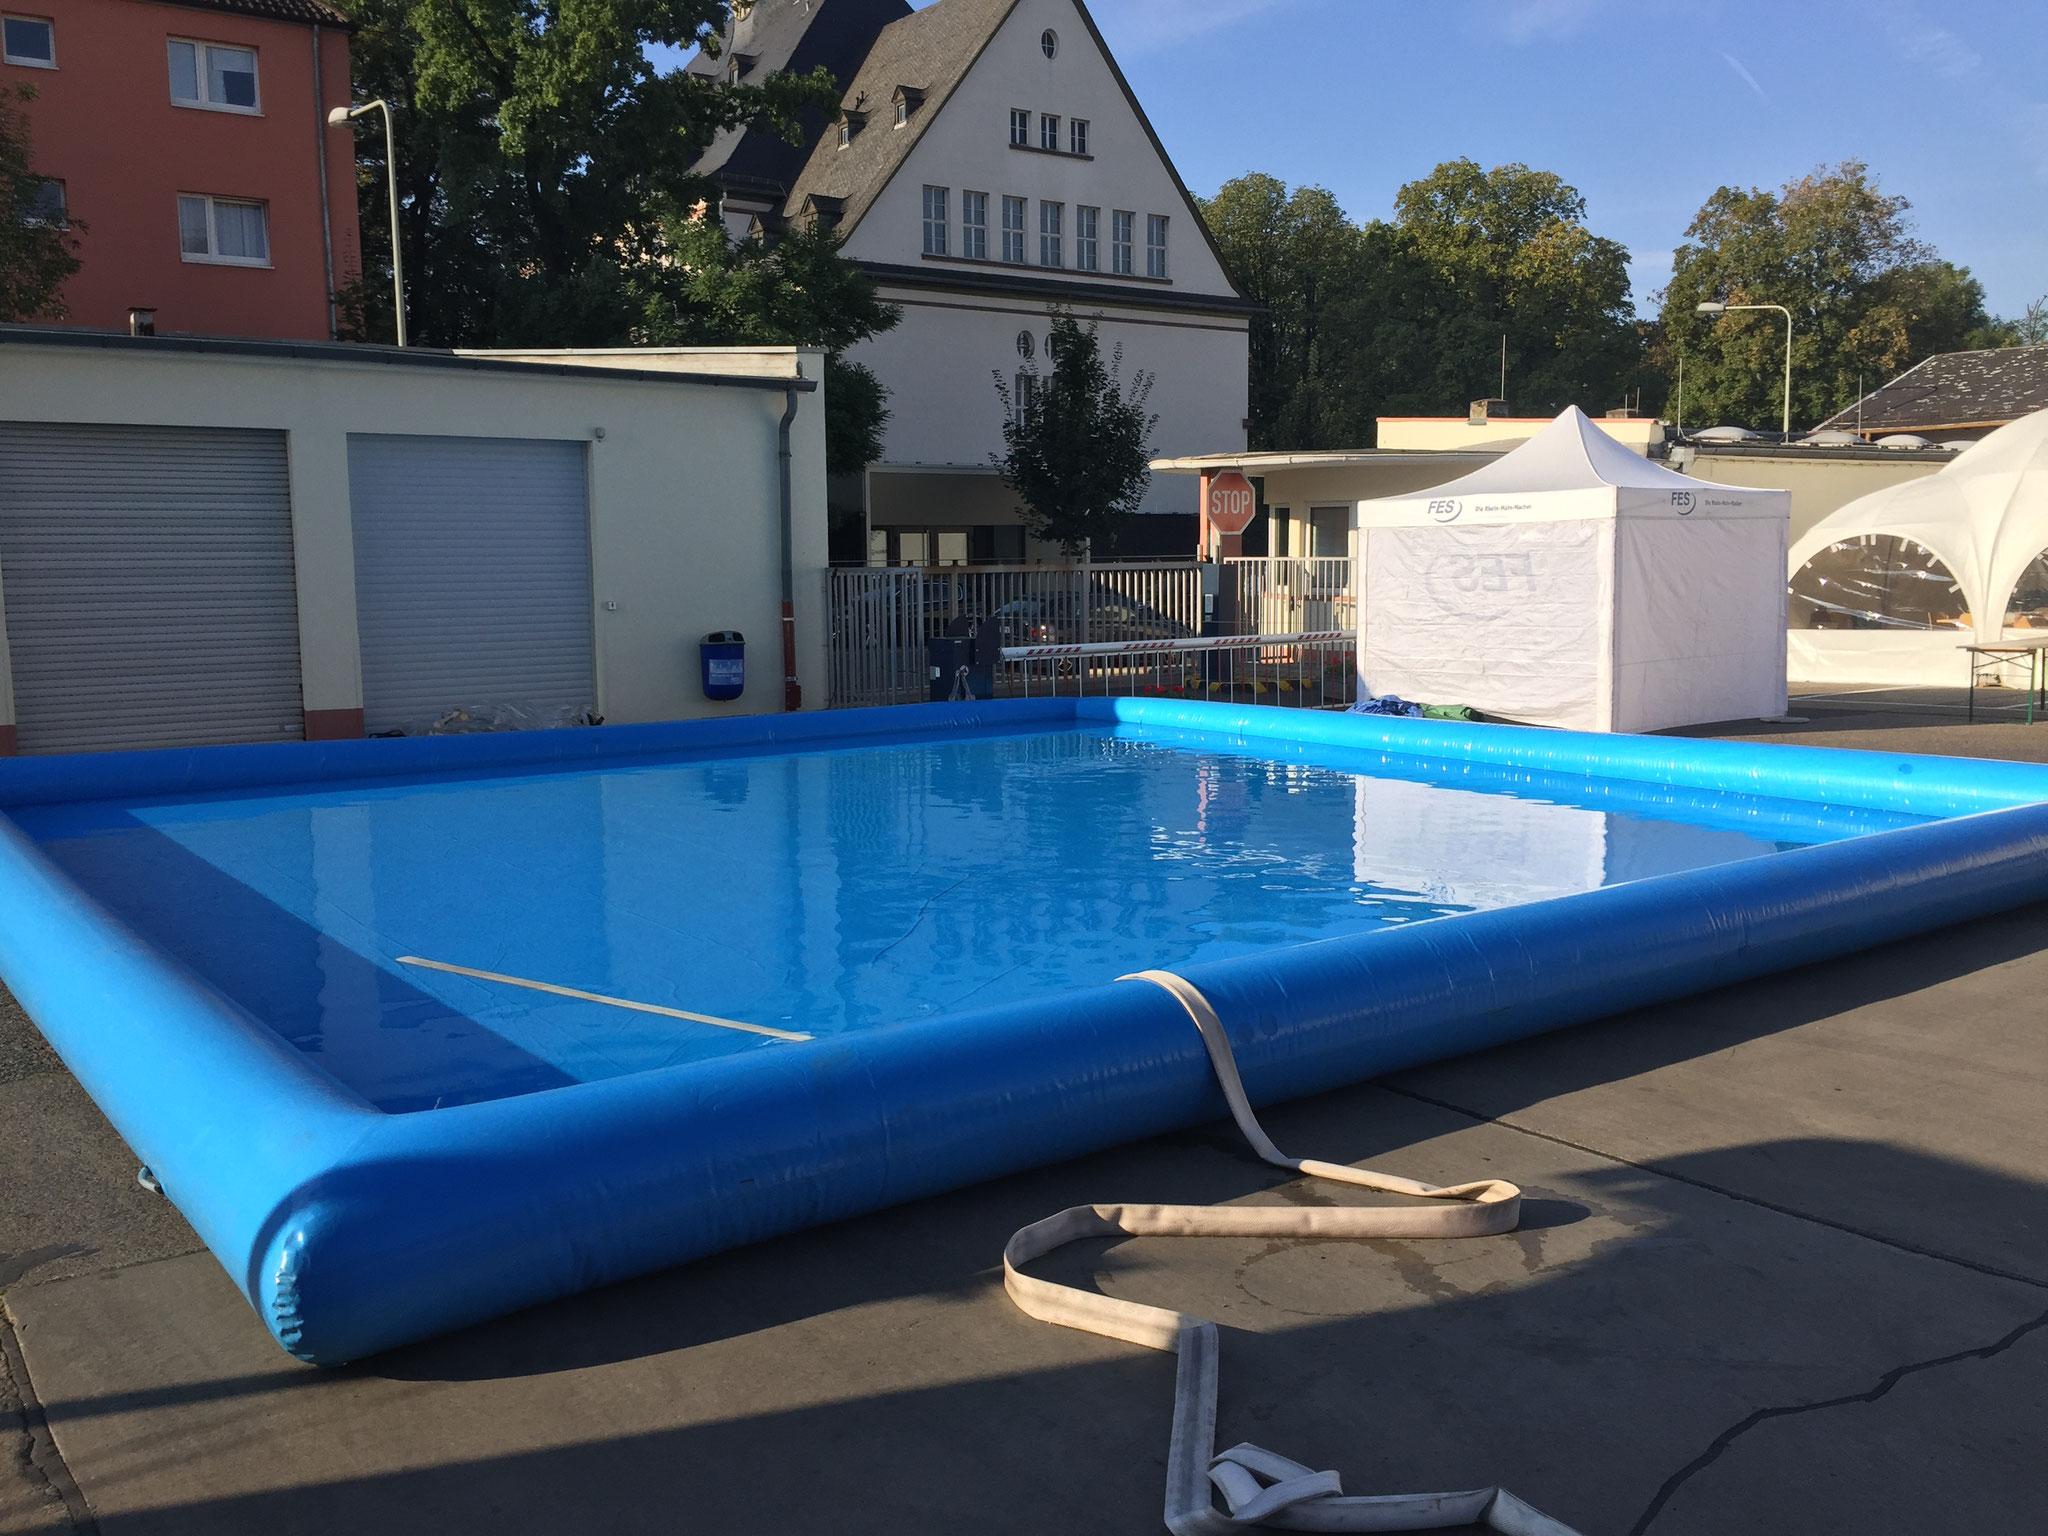 10 Meter Pool, Platzbedarf 10x10x2,5 Meter